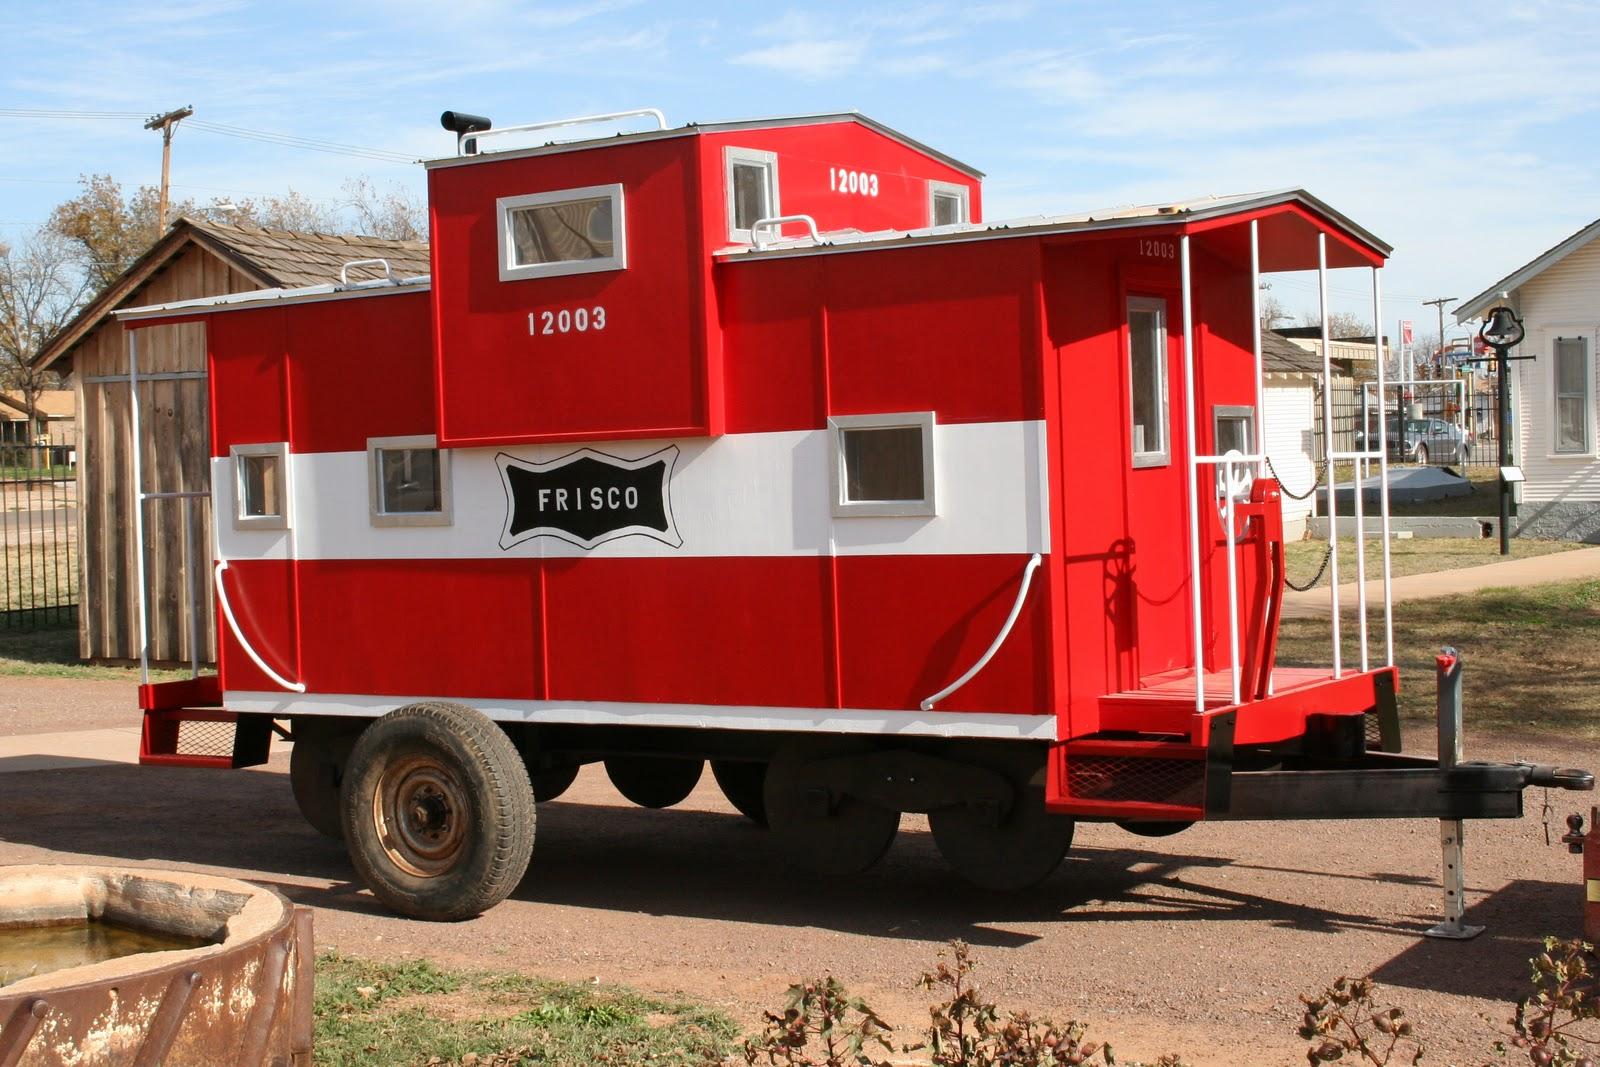 Tillman County Chronicles: Replica Rail Car Giveaway